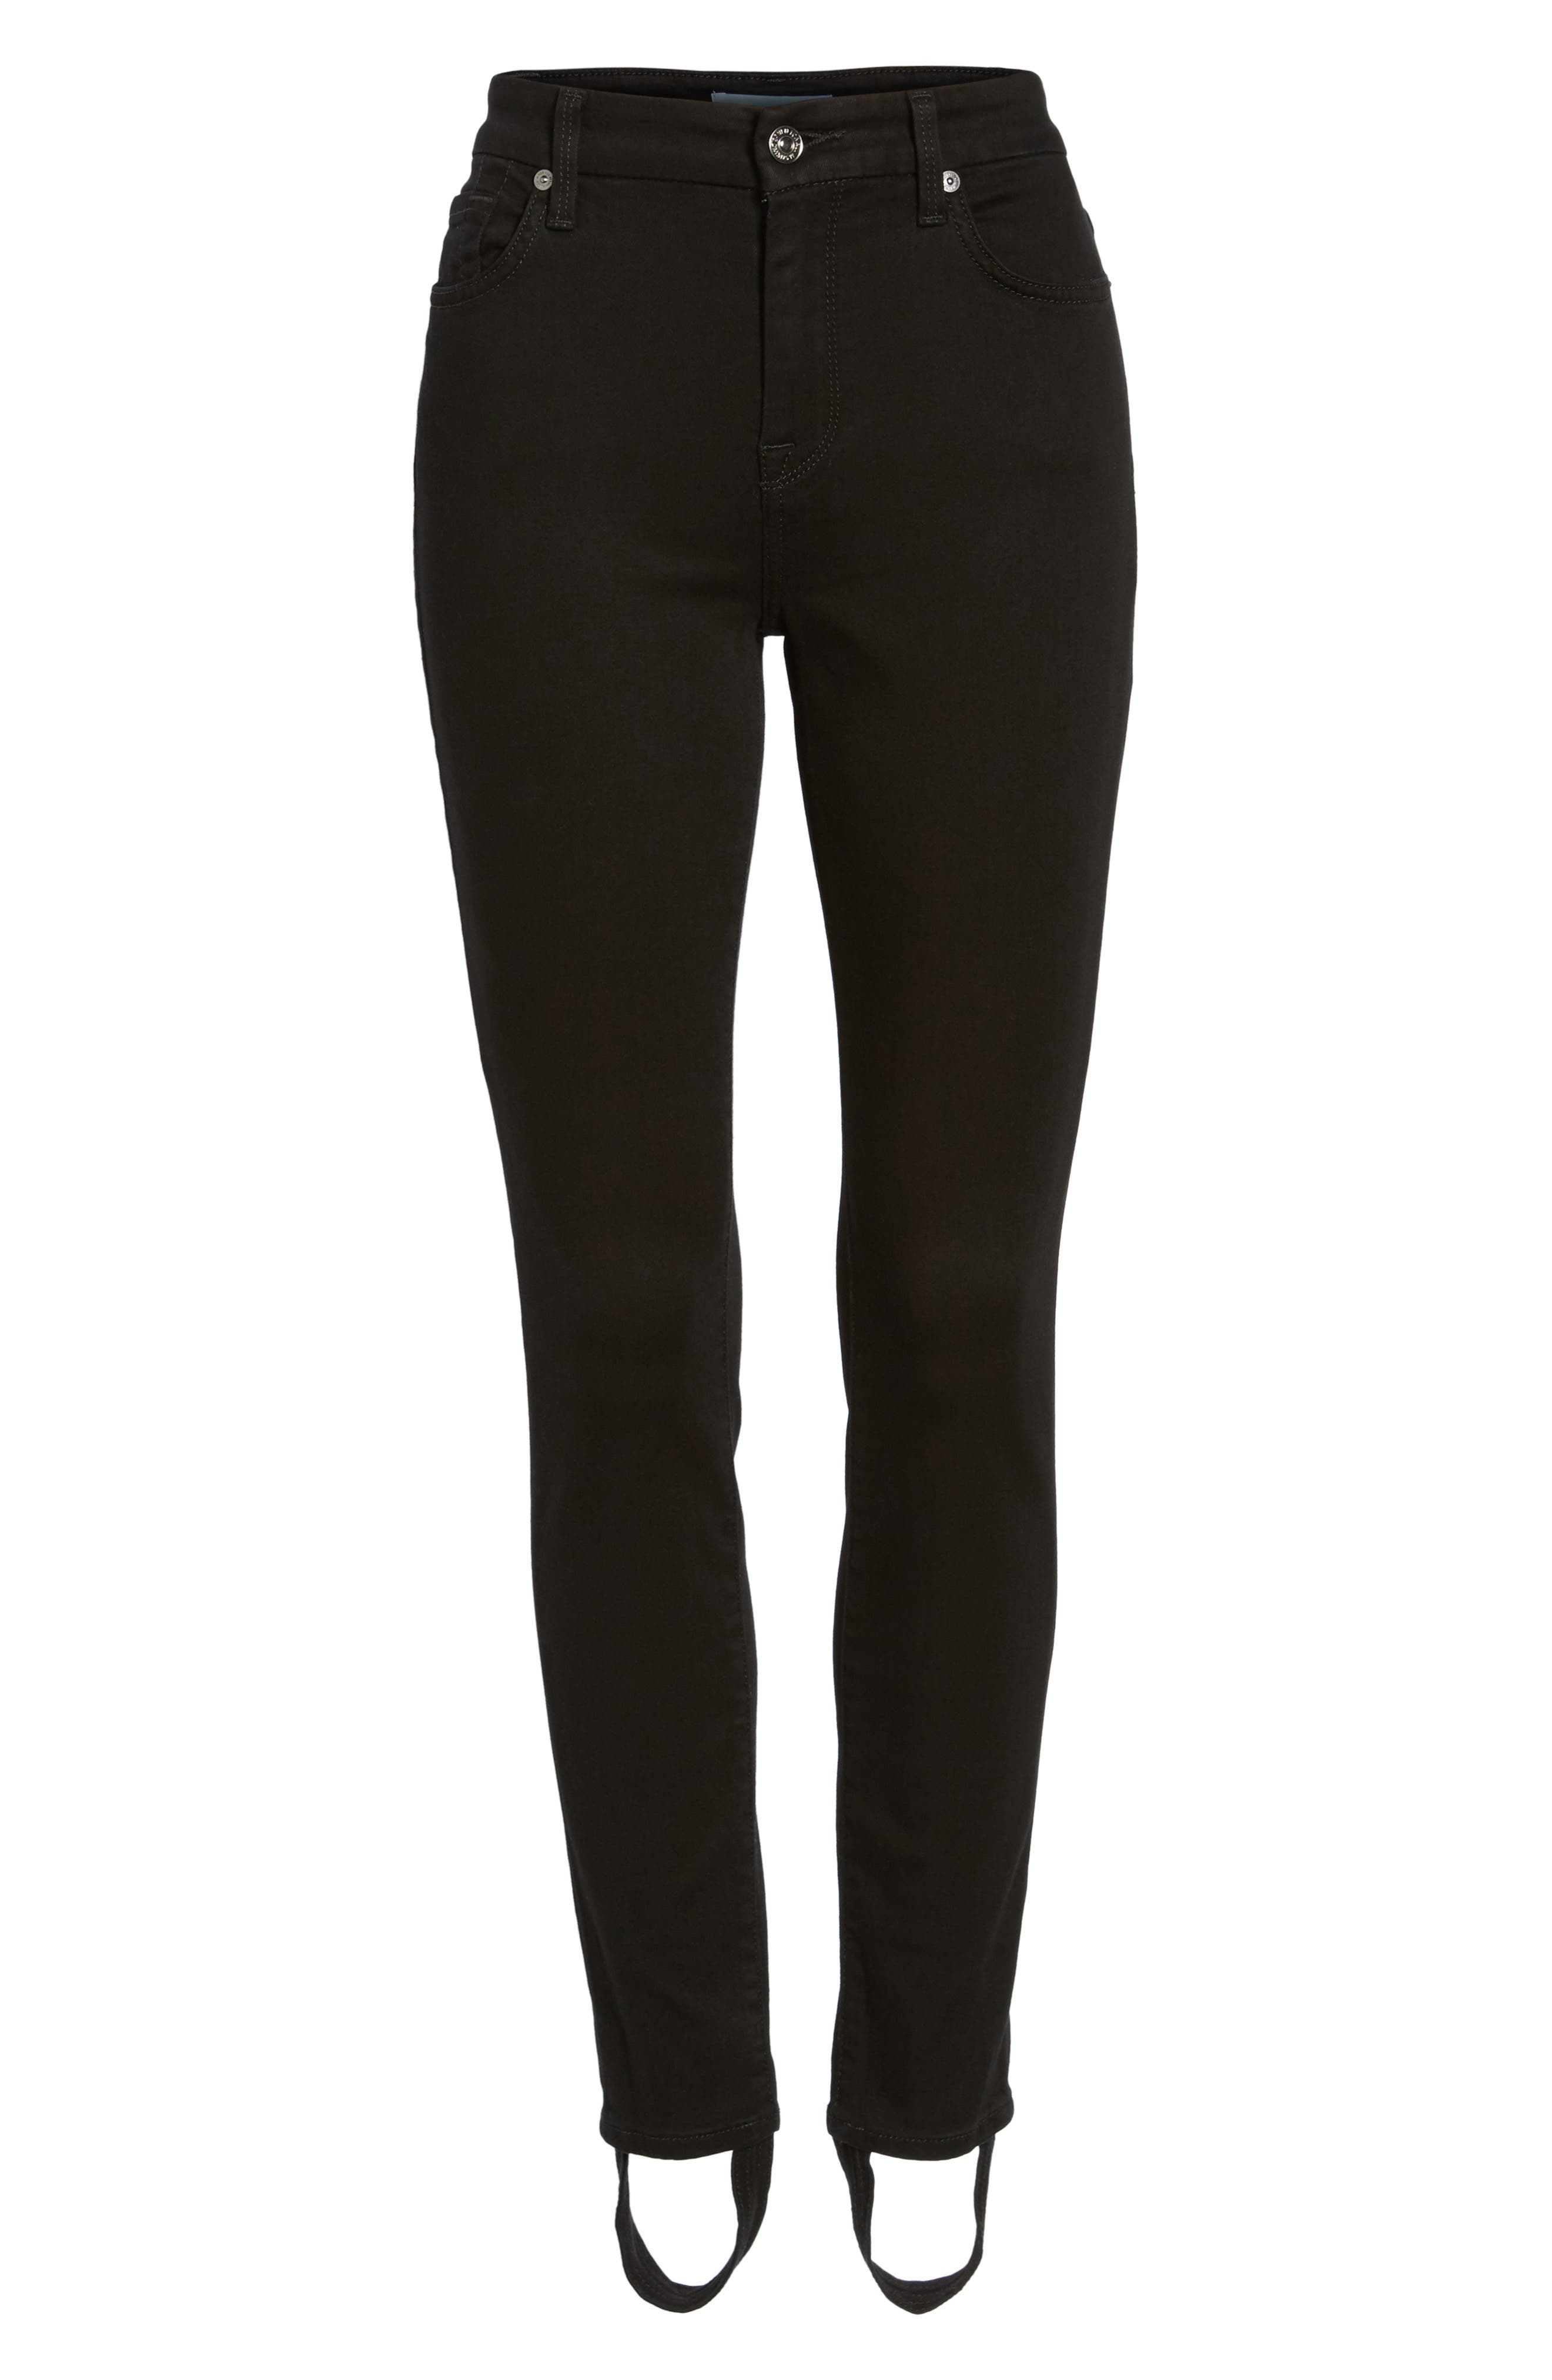 b(air) High Waist Ankle Skinny Stirrup Jeans,                             Alternate thumbnail 6, color,                             004